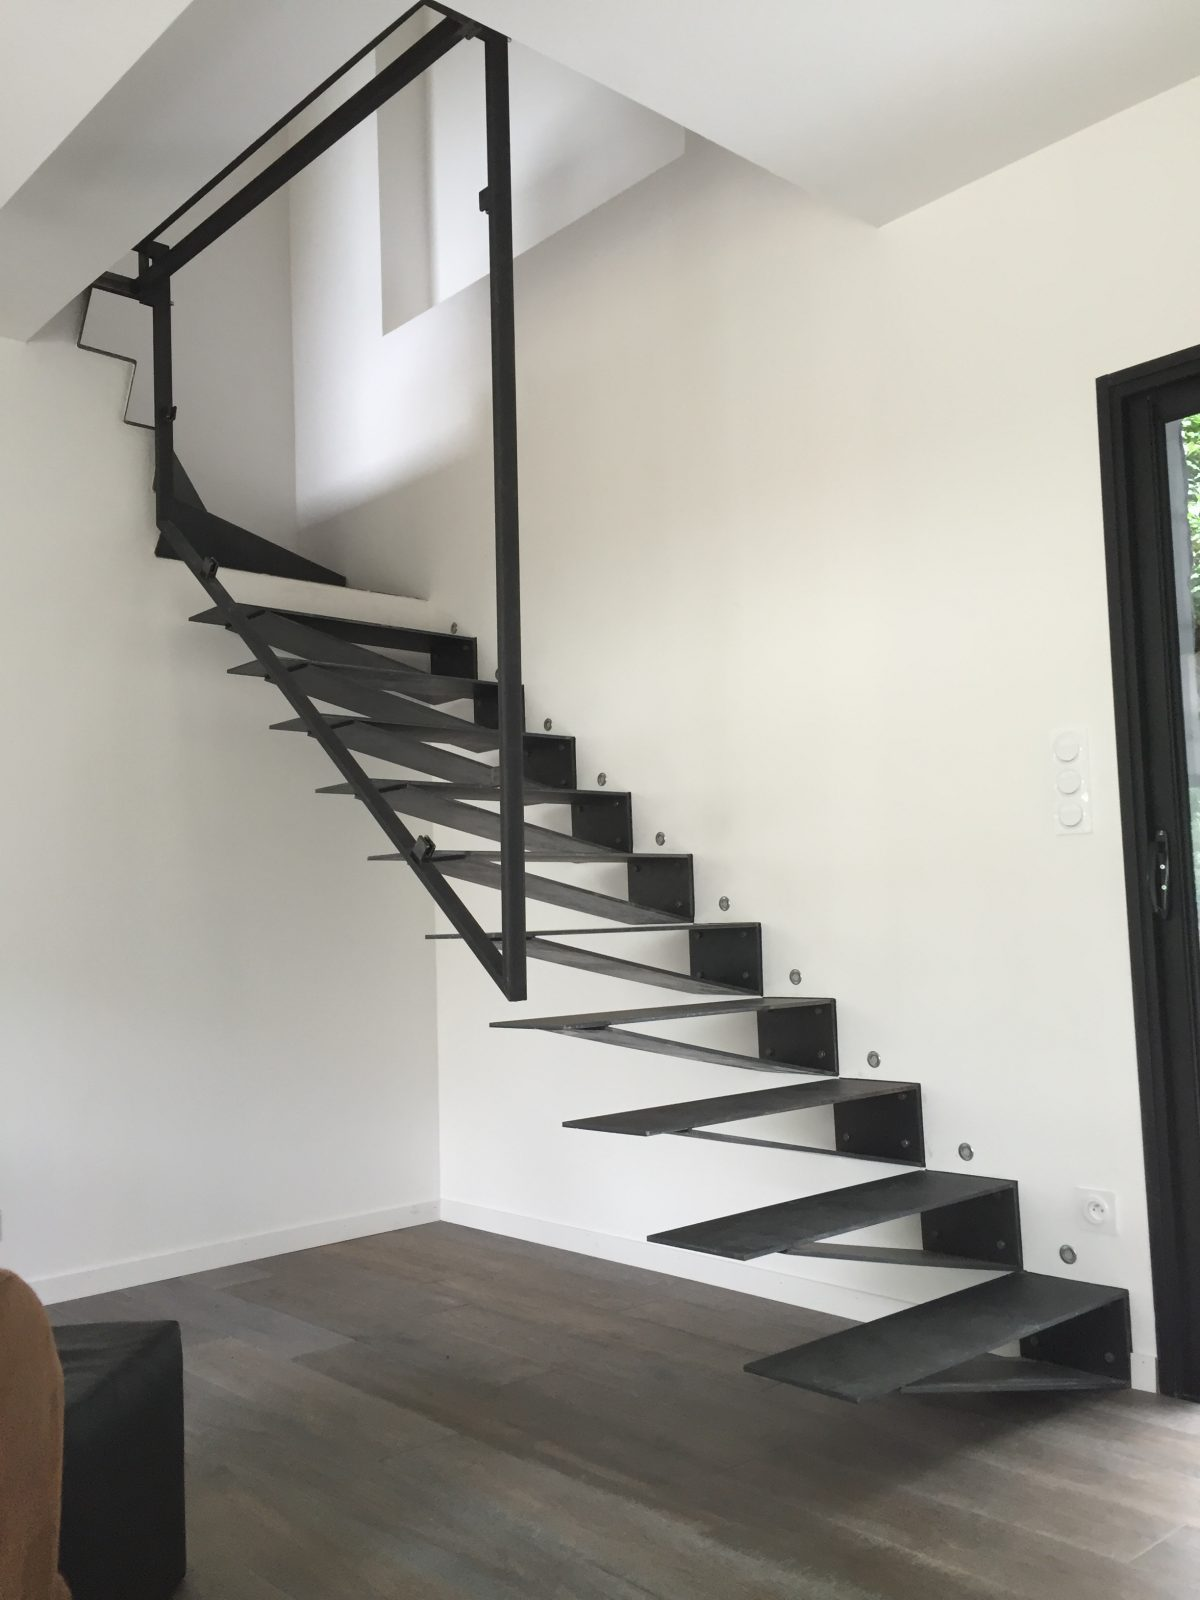 Escalier Marches Suspendues Mur escalier suspendu - hagane